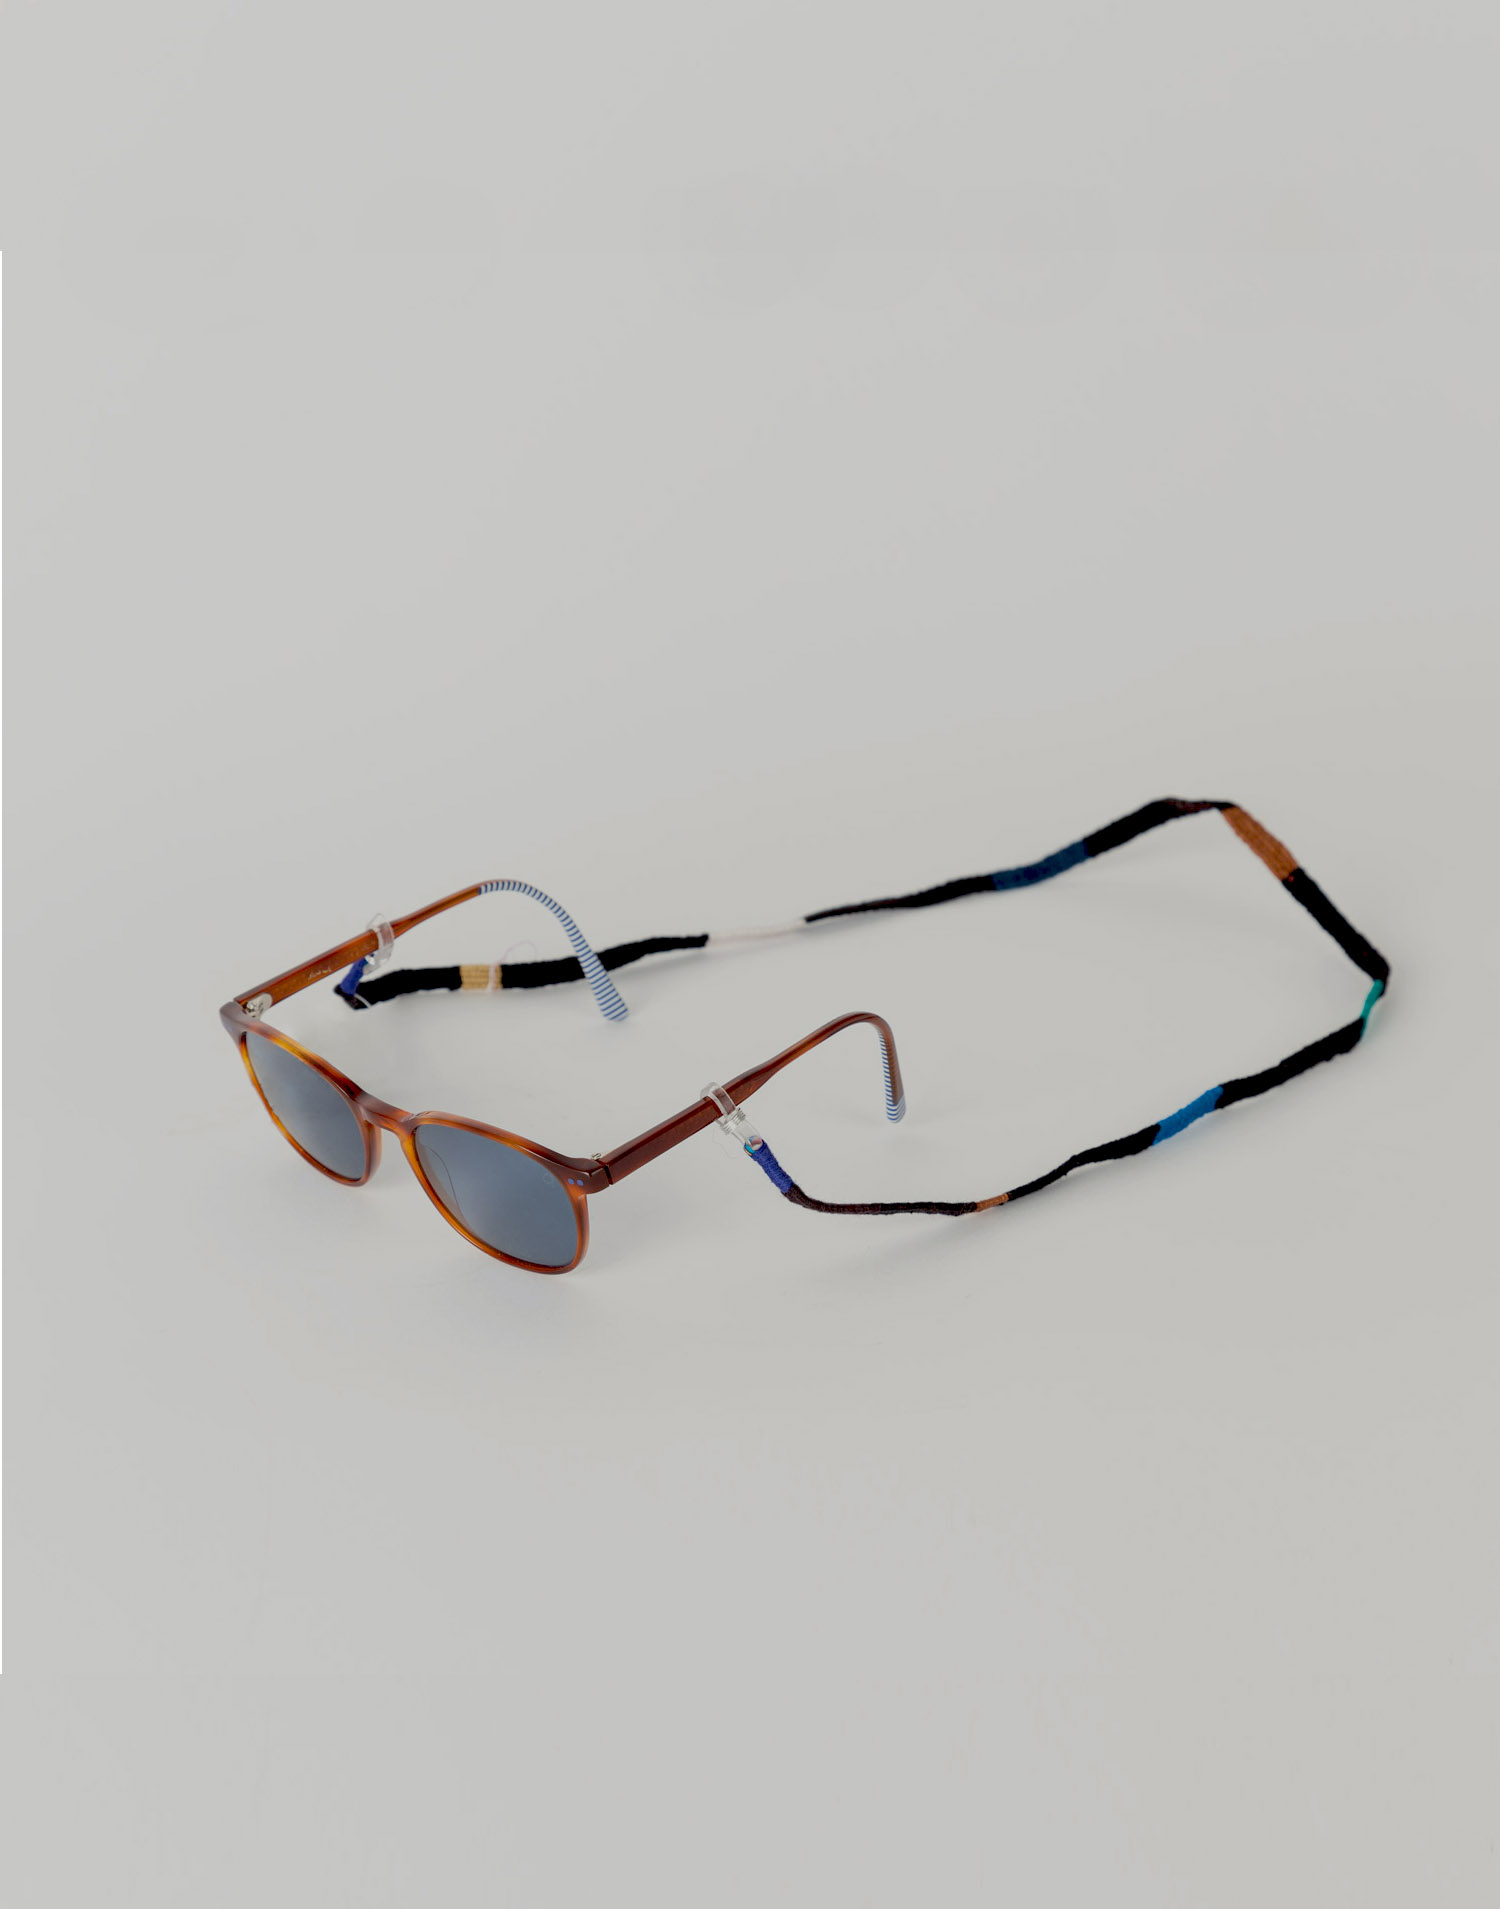 Cordón gafas artesanal